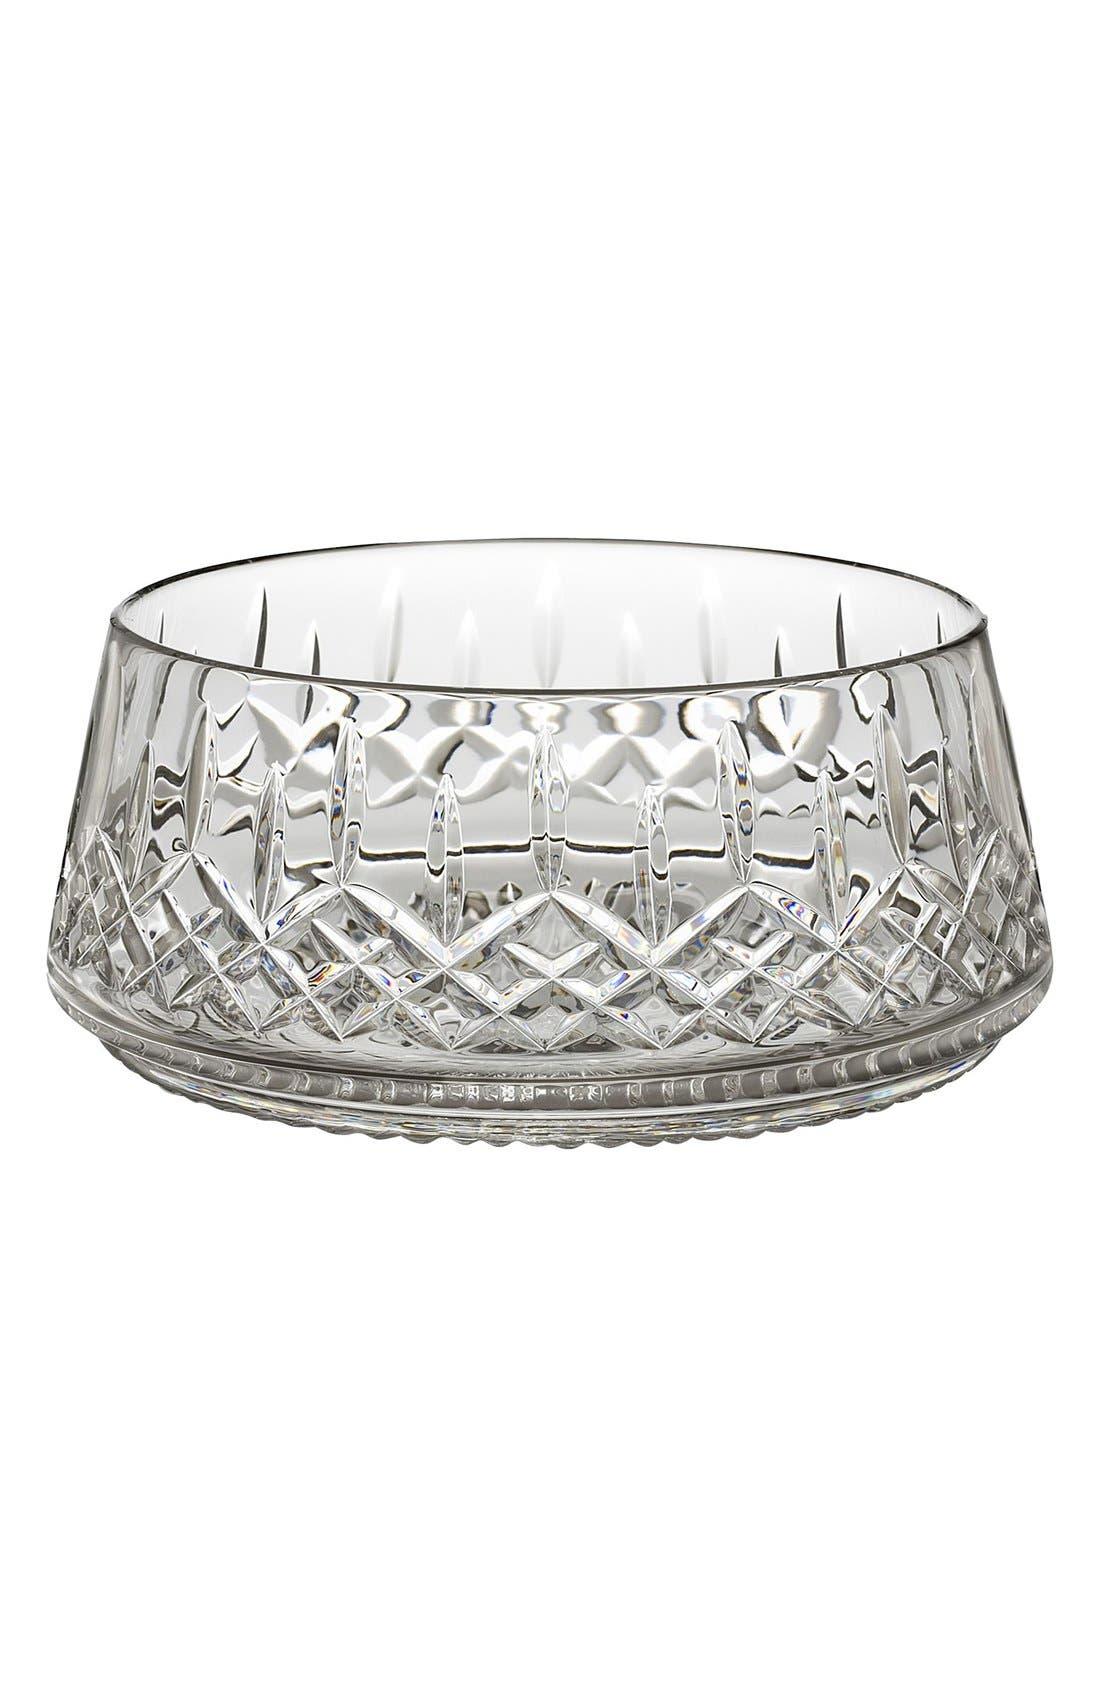 Alternate Image 1 Selected - Waterford 'Lismore' Lead Crystal Salad Bowl